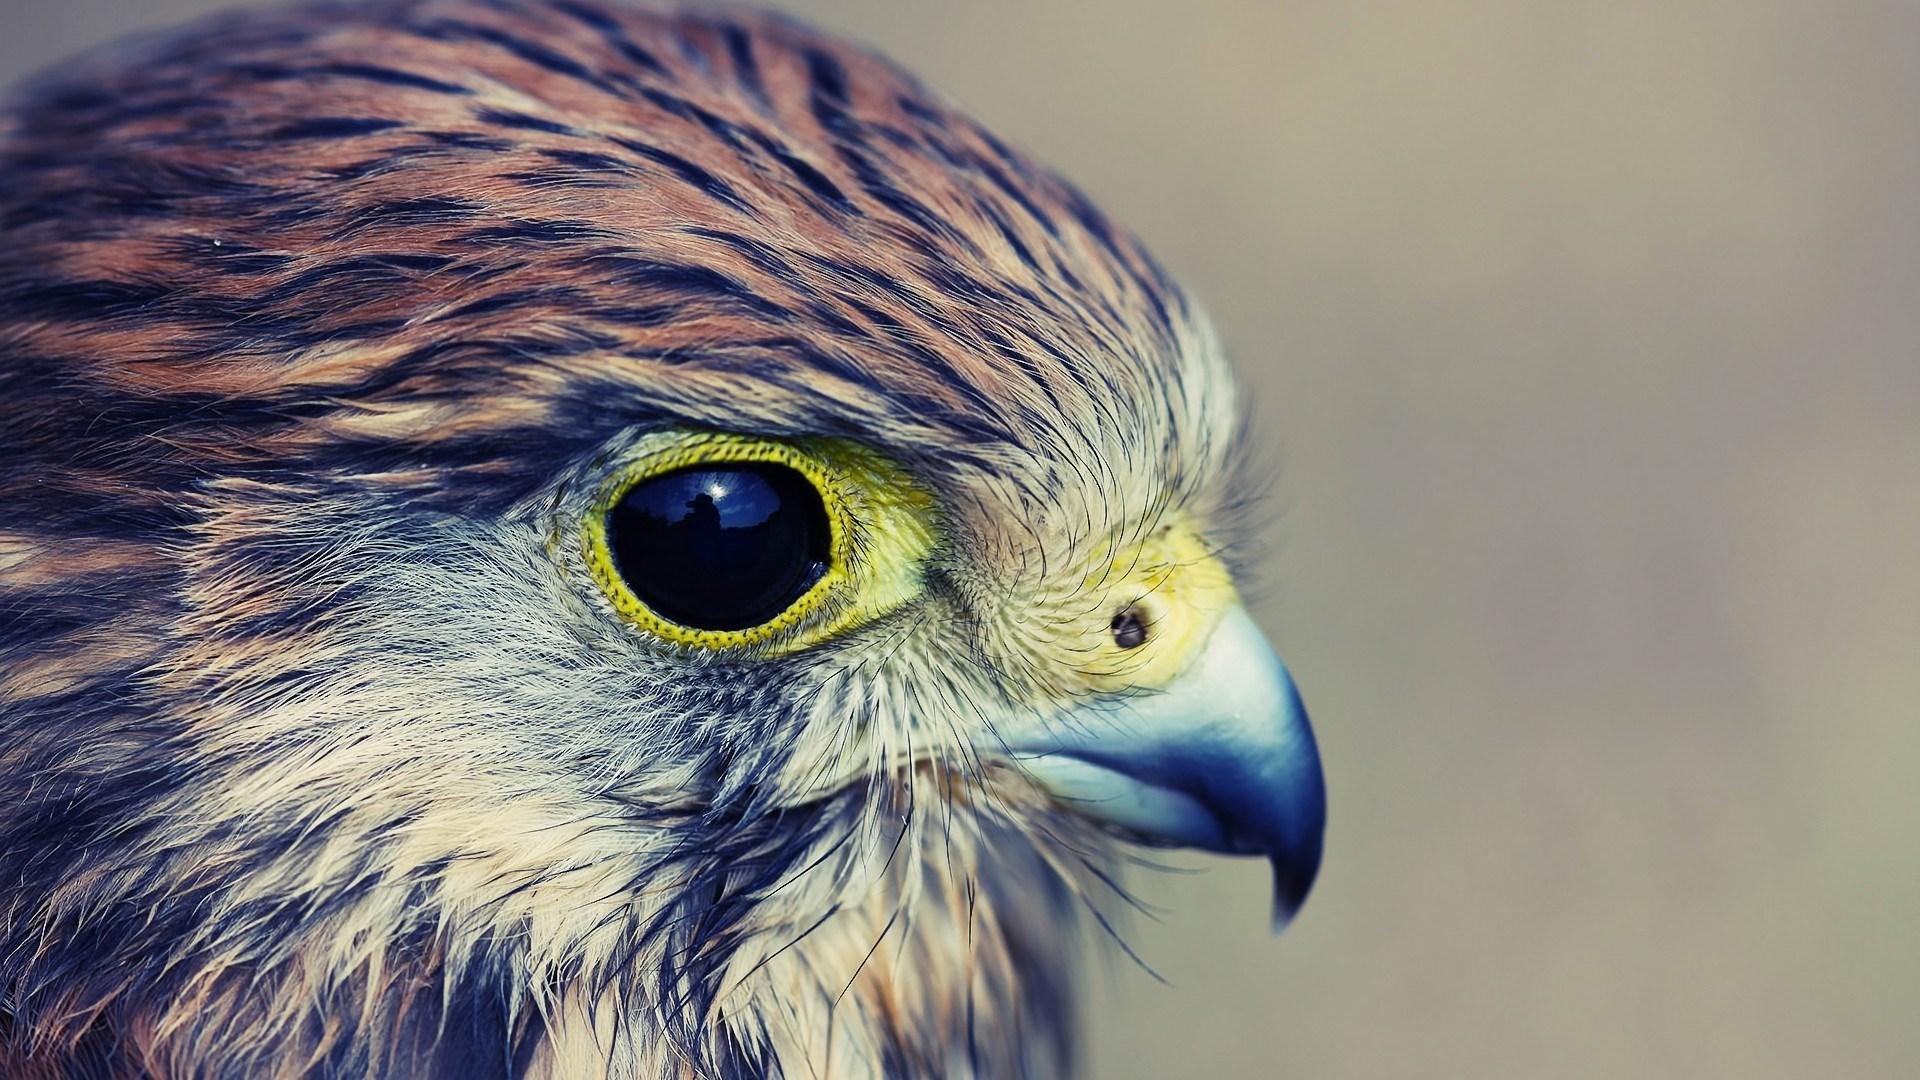 Bird of Prey Hawk Close-Up #6995982